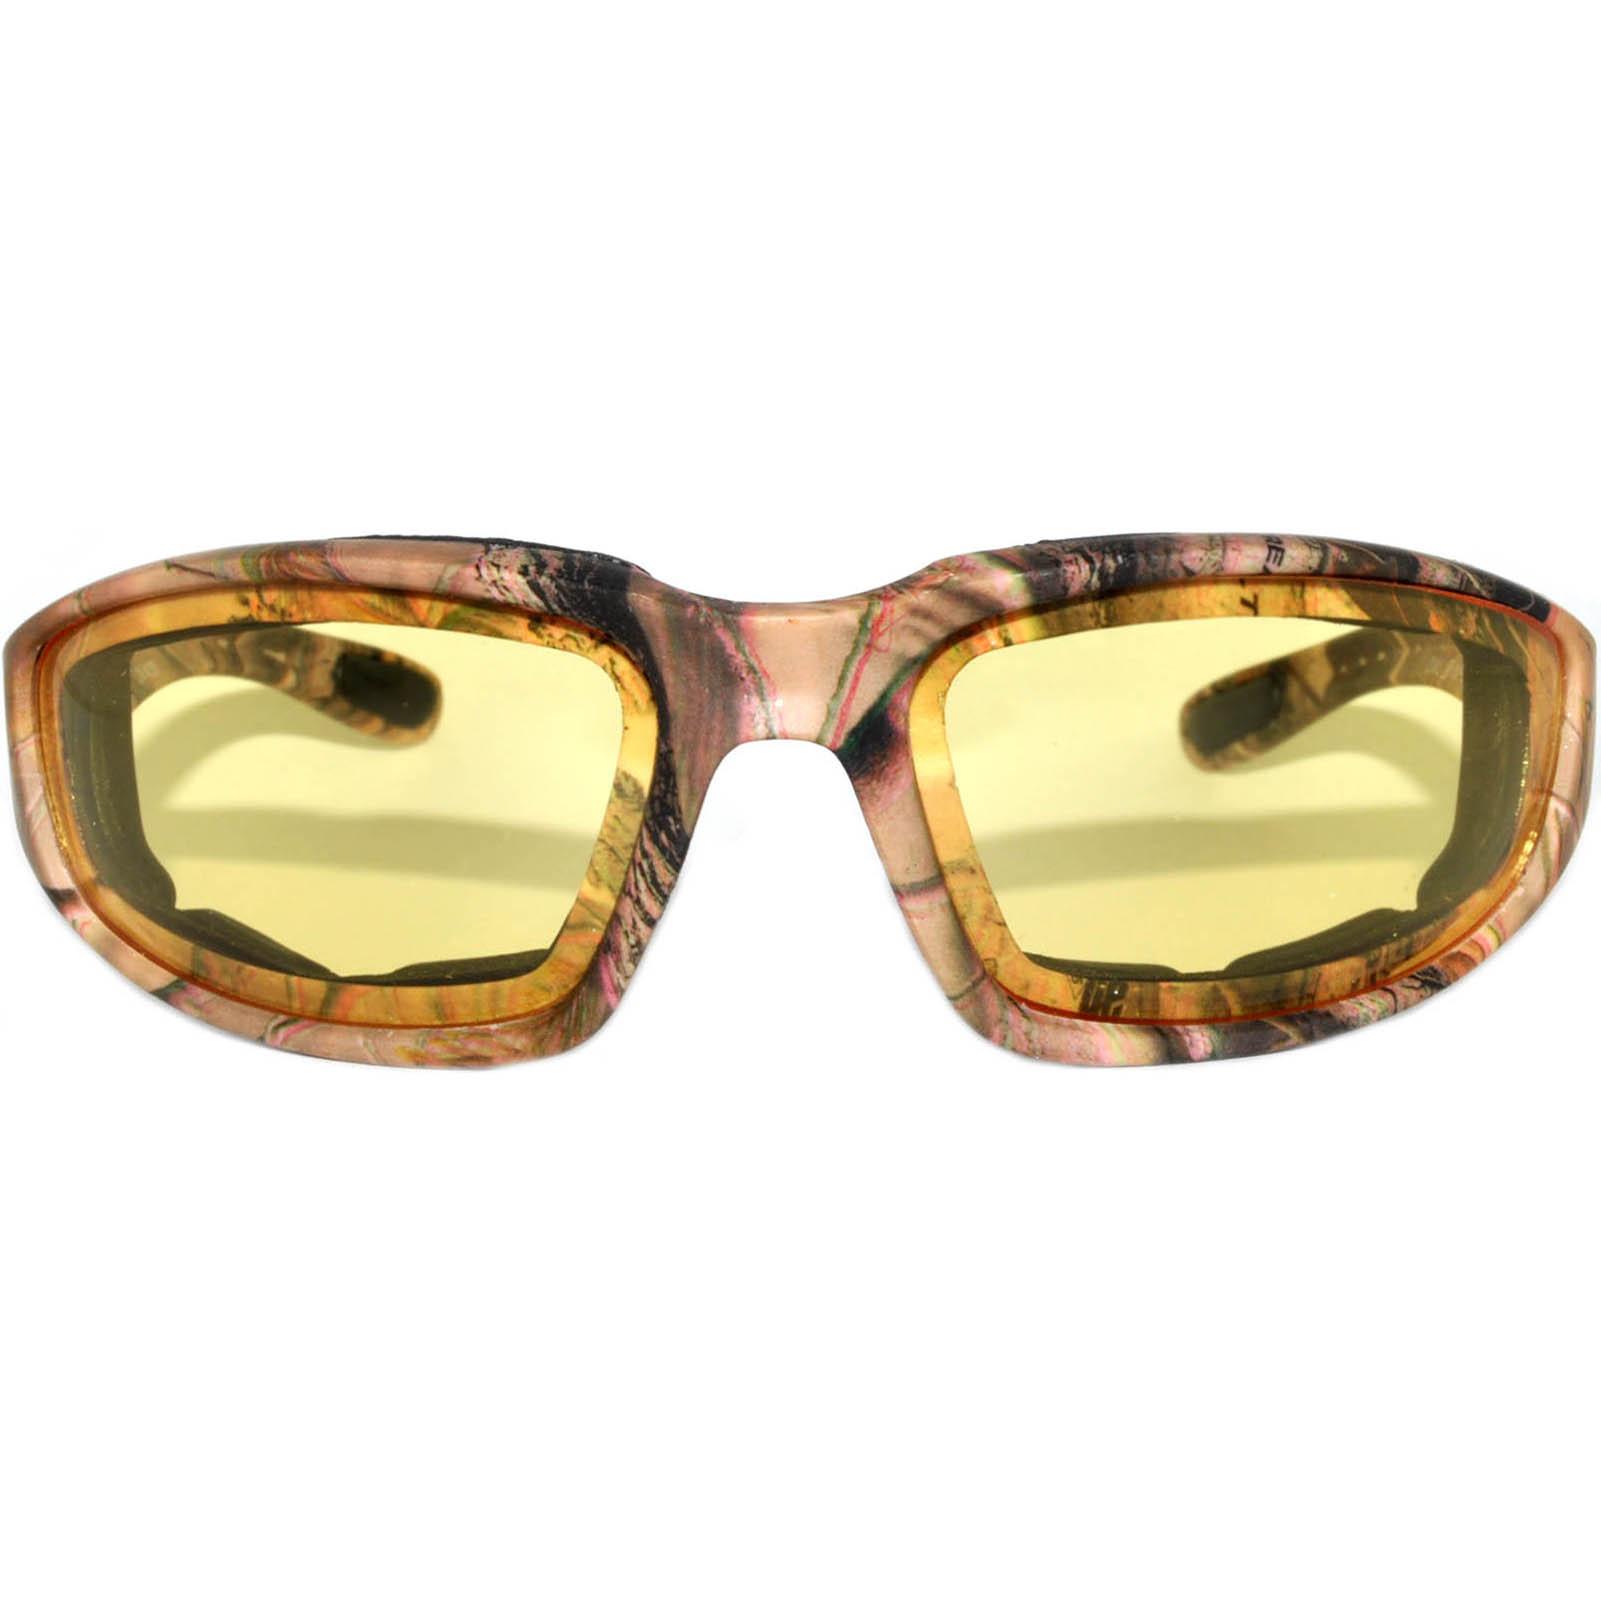 OWL Eyewear Motorcycle Padded Glasses Camo#3 Frame Yellow High ...